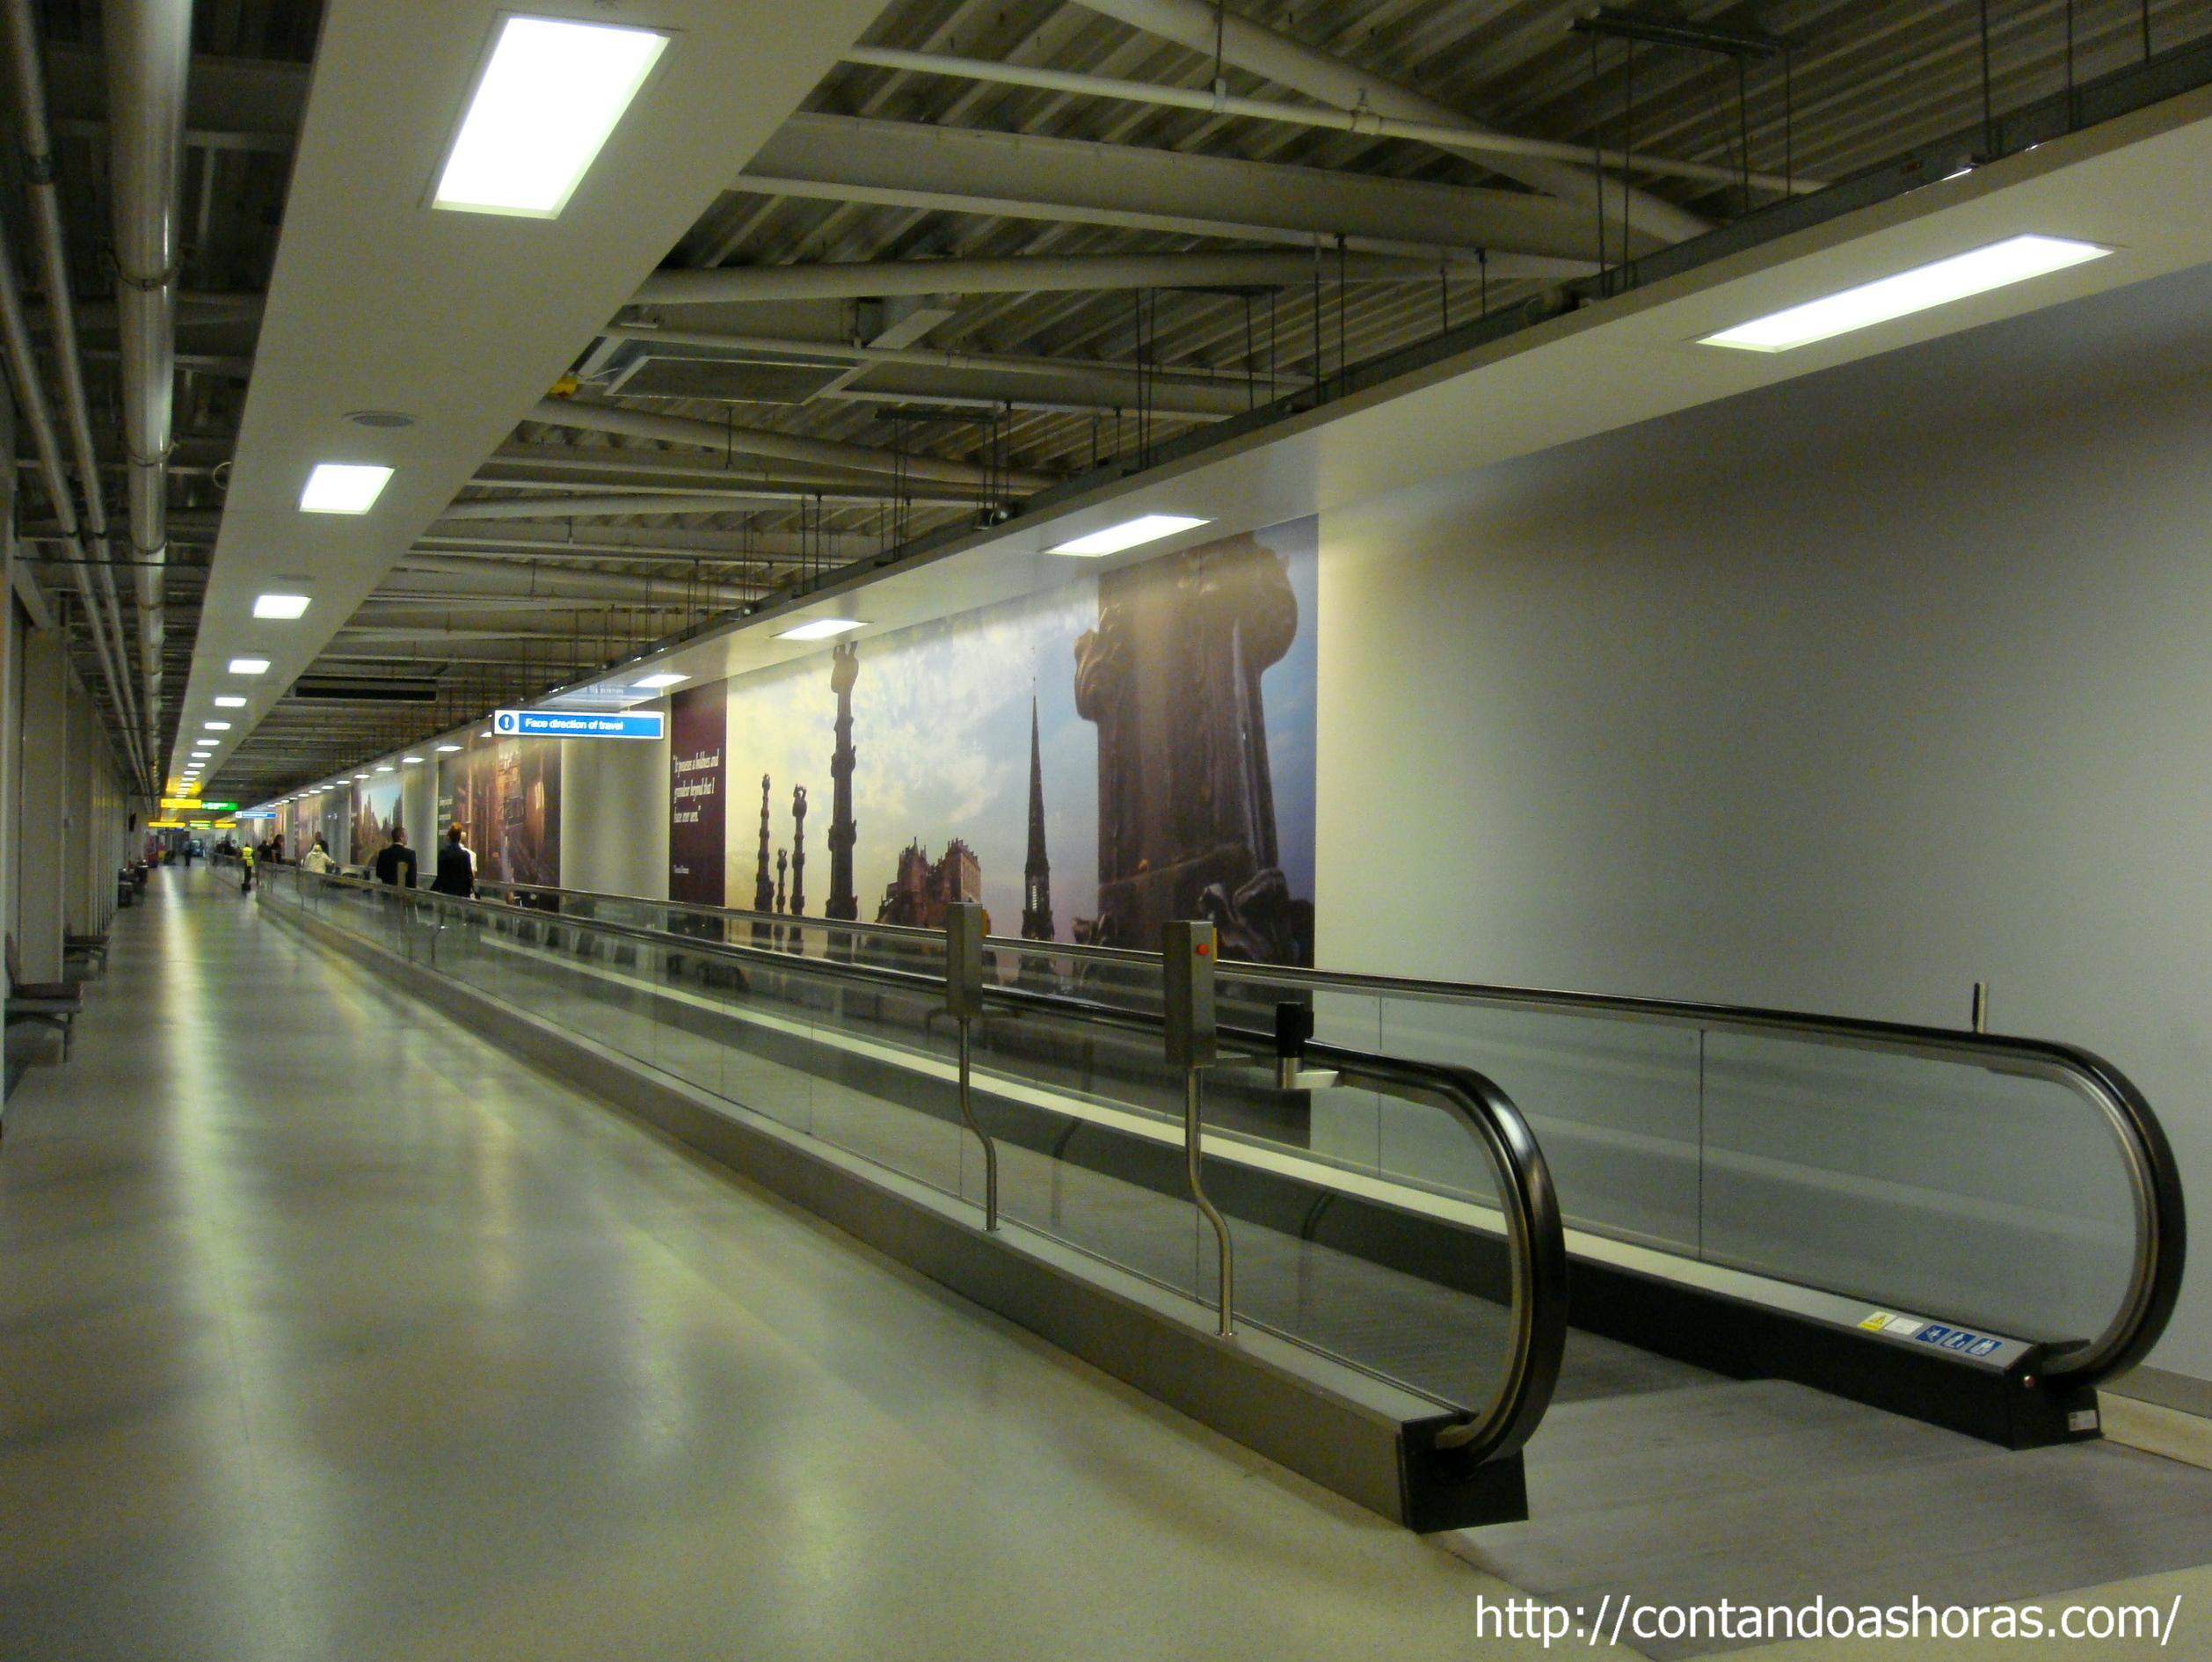 Aeroporto Edimburgo : Contando as horas arquivos aeroporto de edimburgo